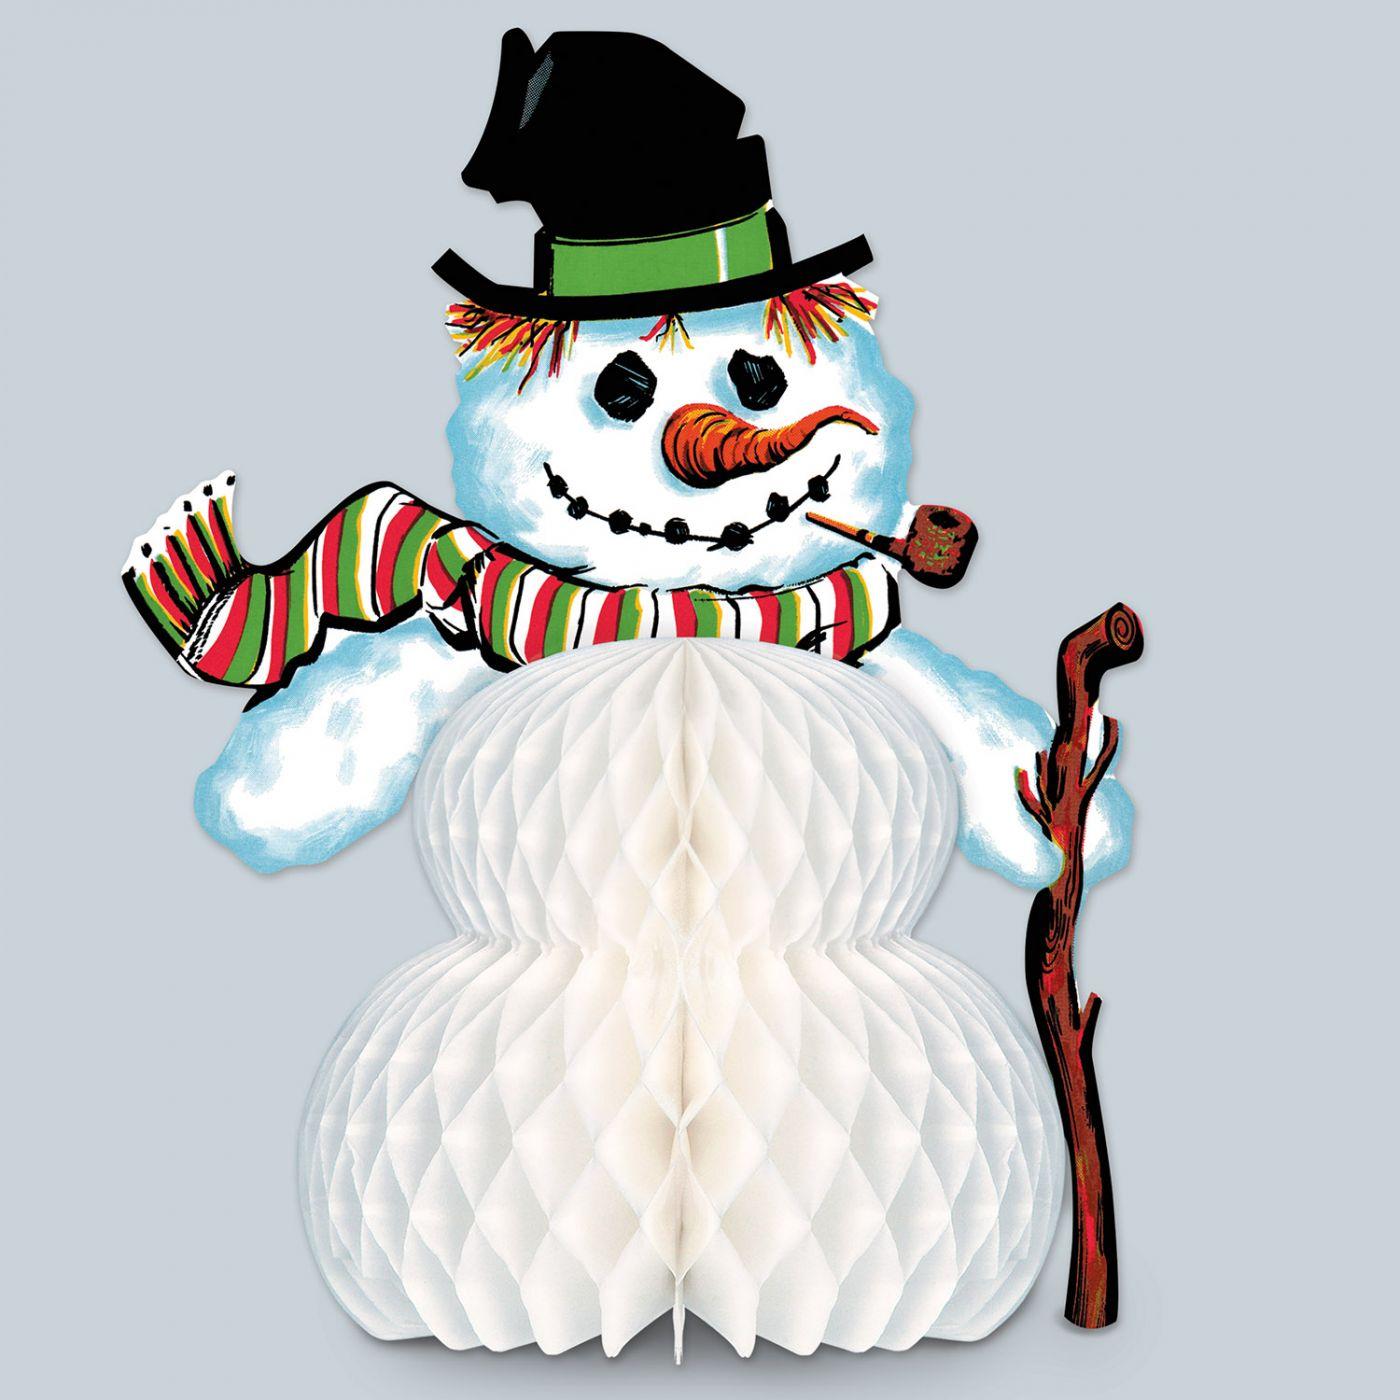 Image of Vintage Christmas Snowman Centerpiece